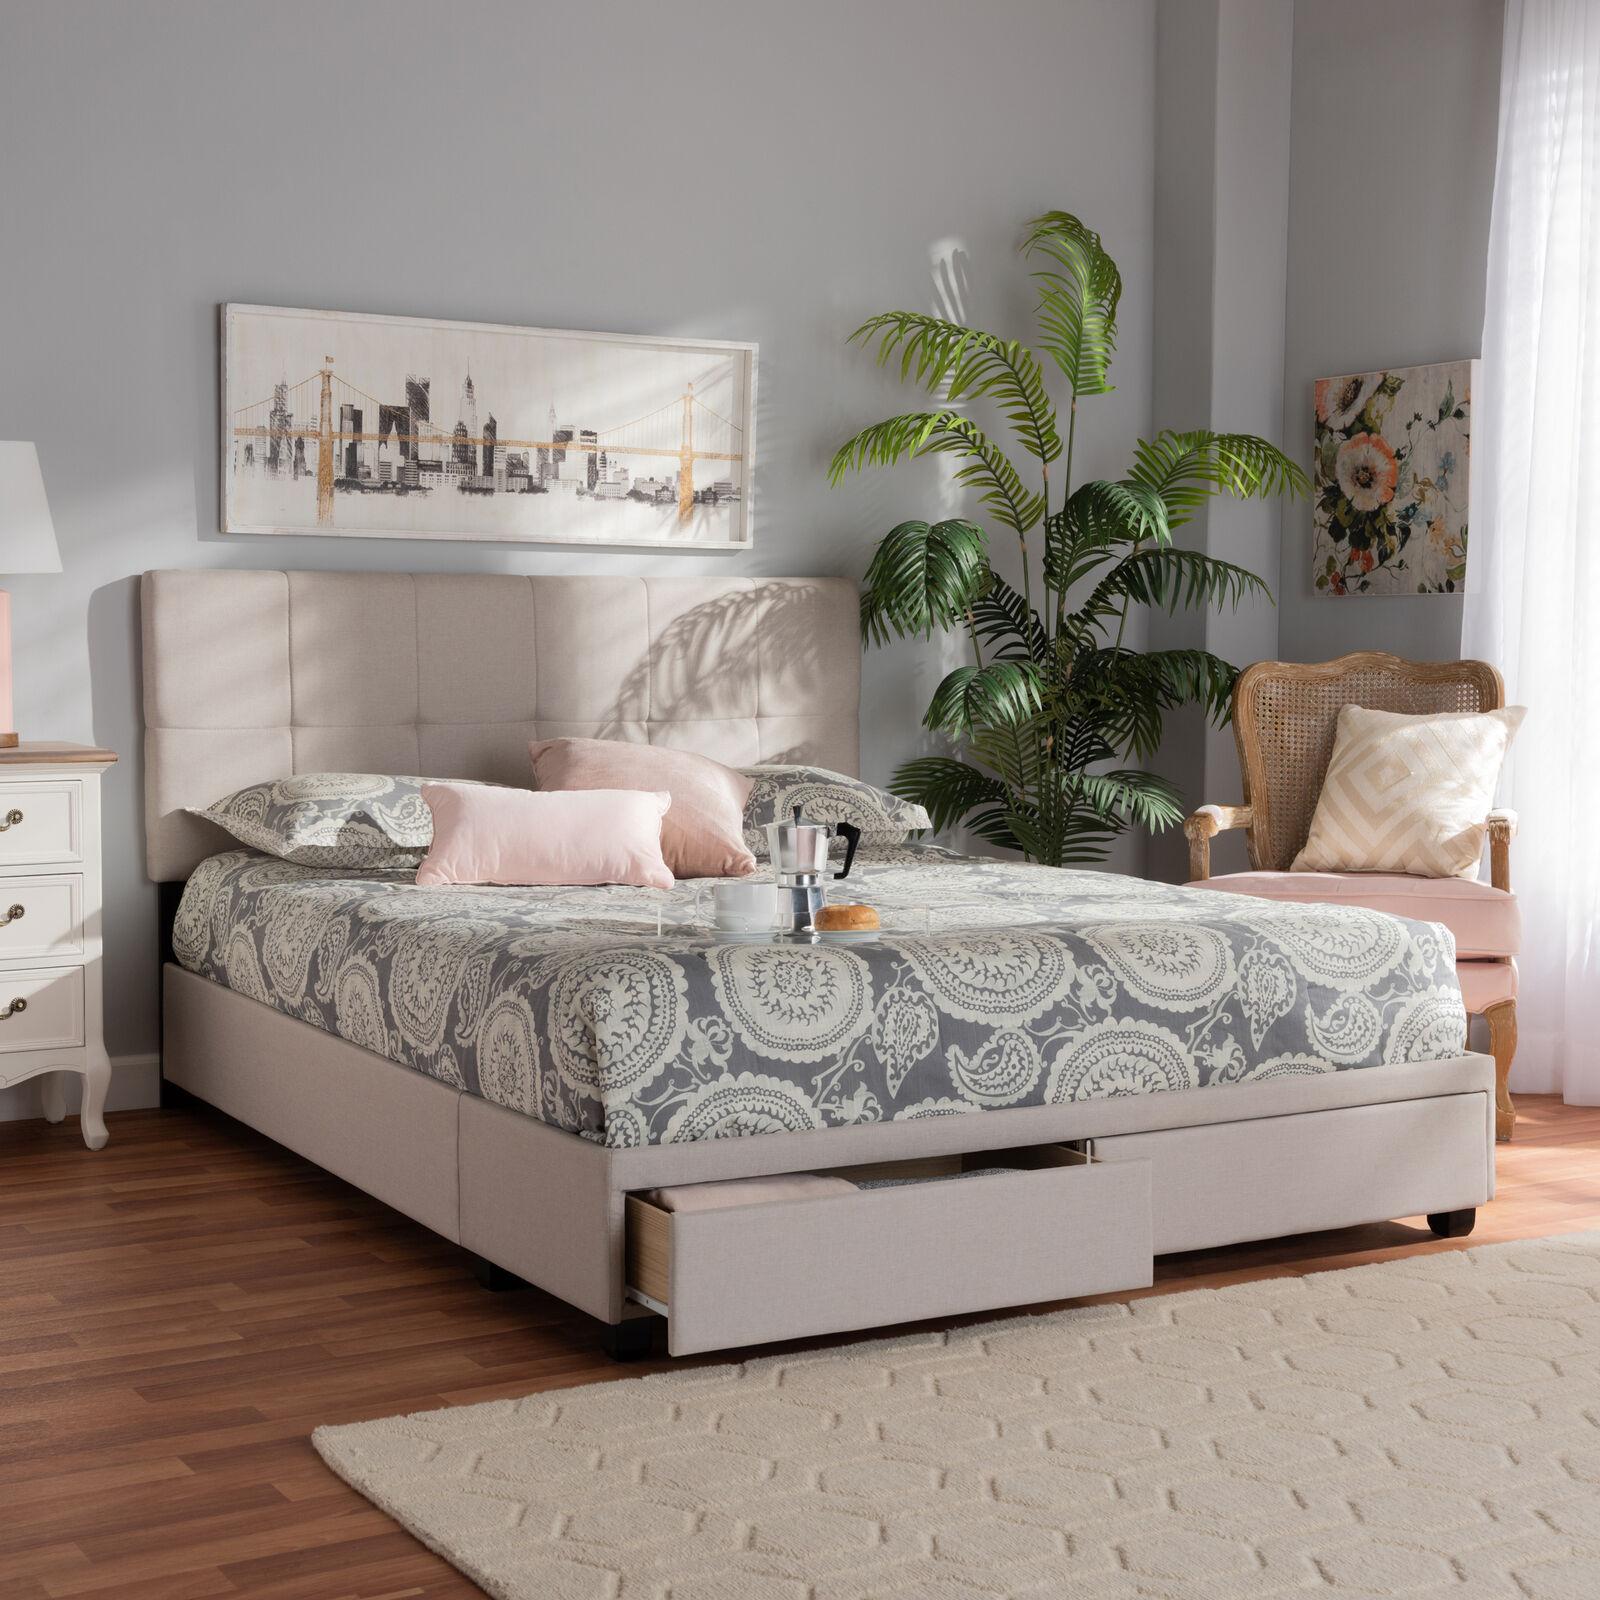 Netti Modern Beige Fabric Tufted Headboard 2 Drawer Storage Platform Bed Frame For Sale Online